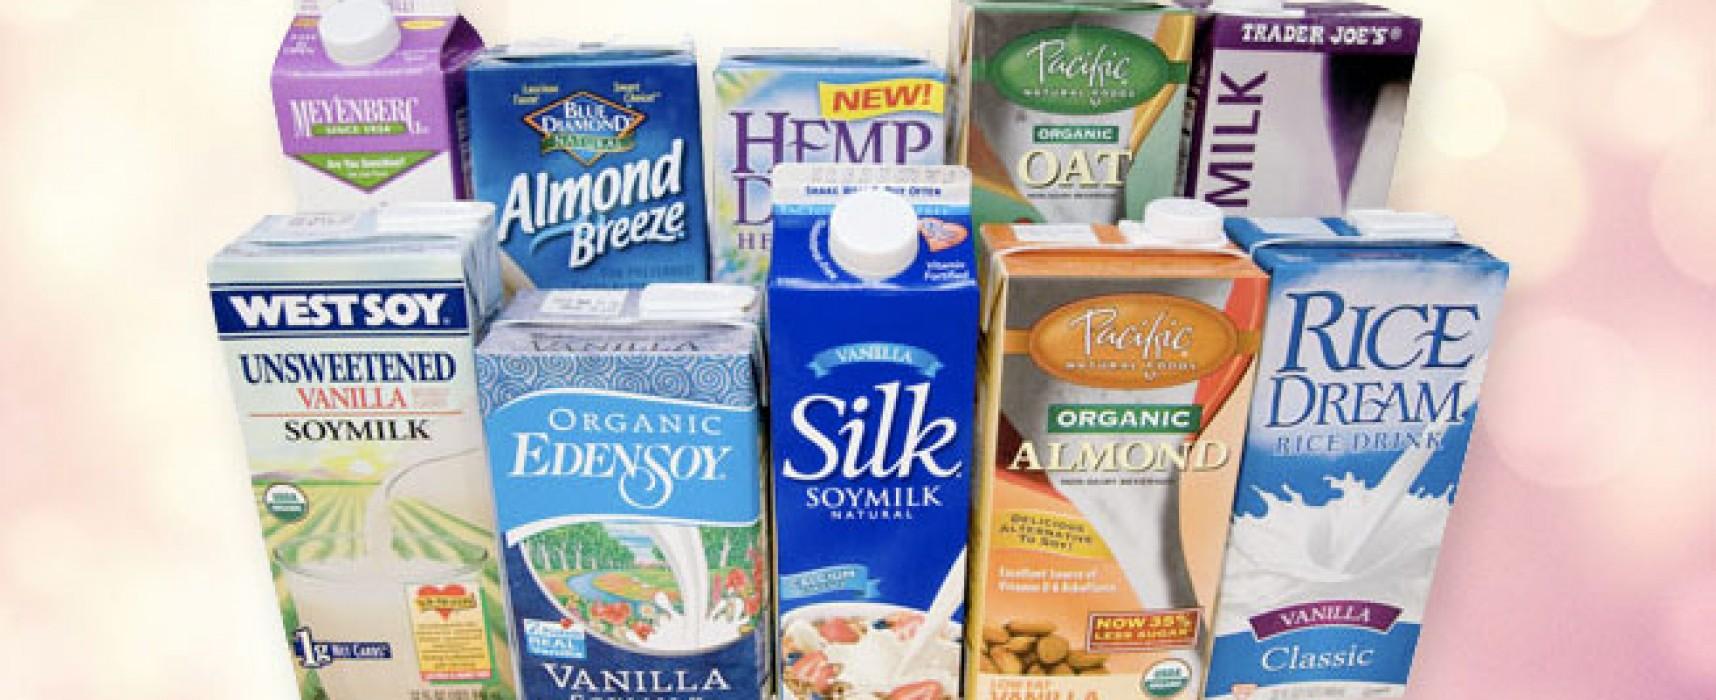 Which Brand Has The Best Tasting Almond Milk